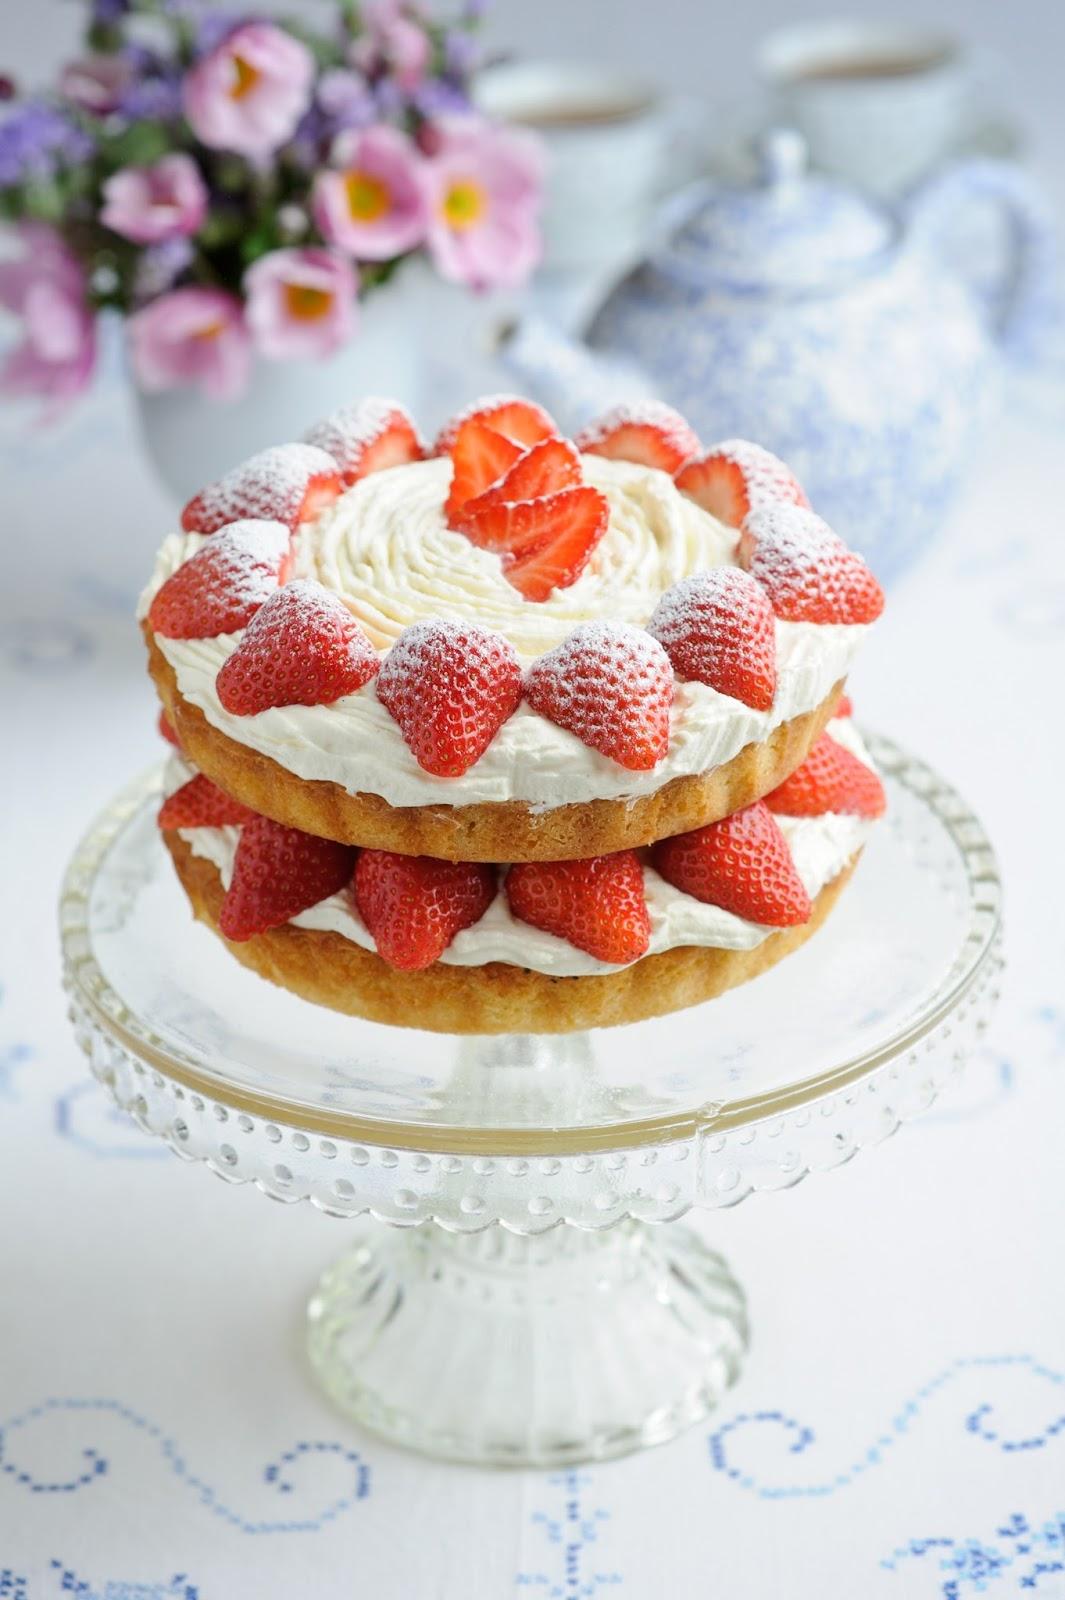 Making A Strawberry Cream Cake